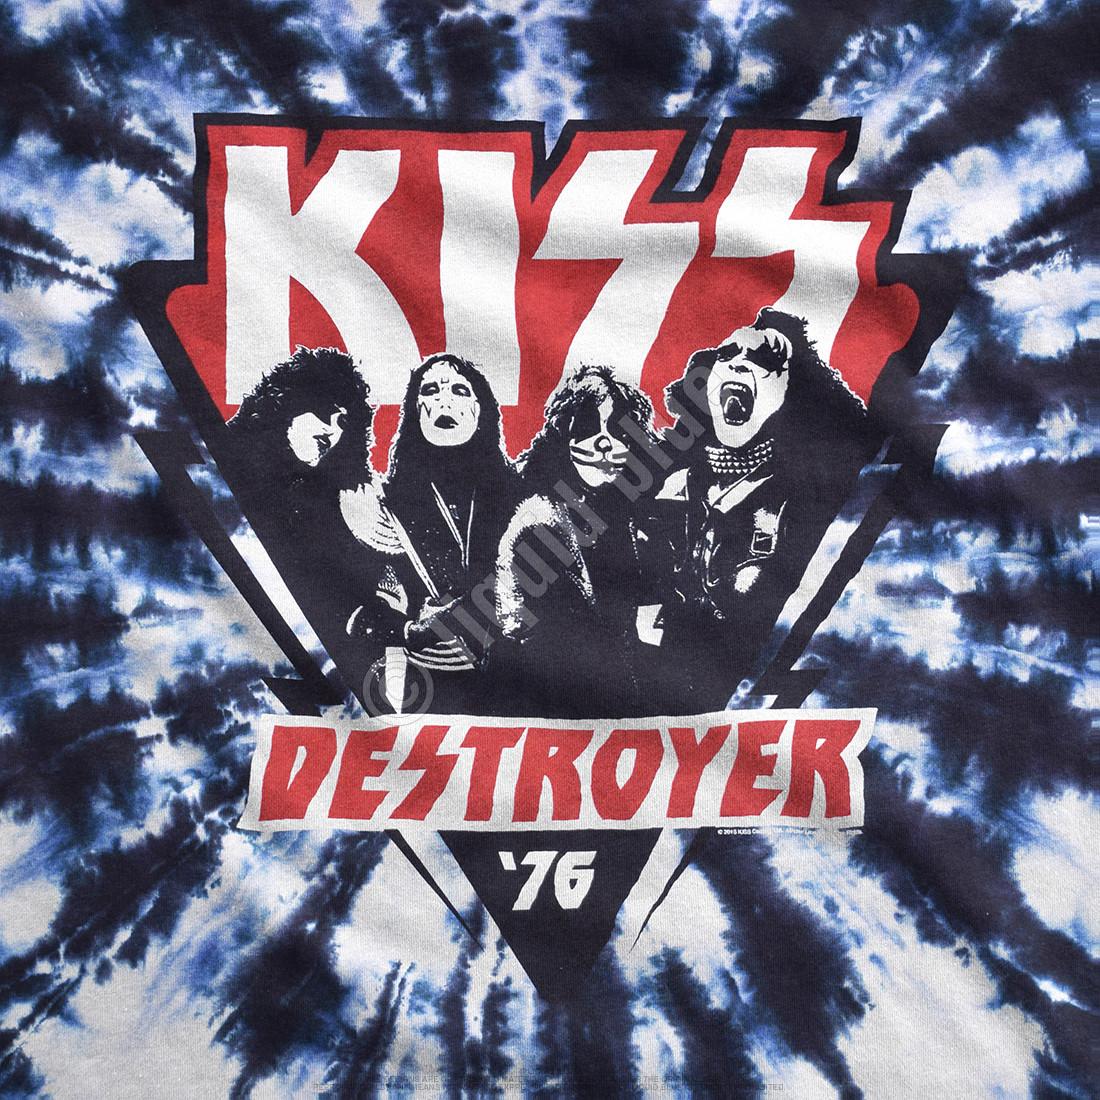 KISS Destroyer '76 Tie-Dye T-Shirt